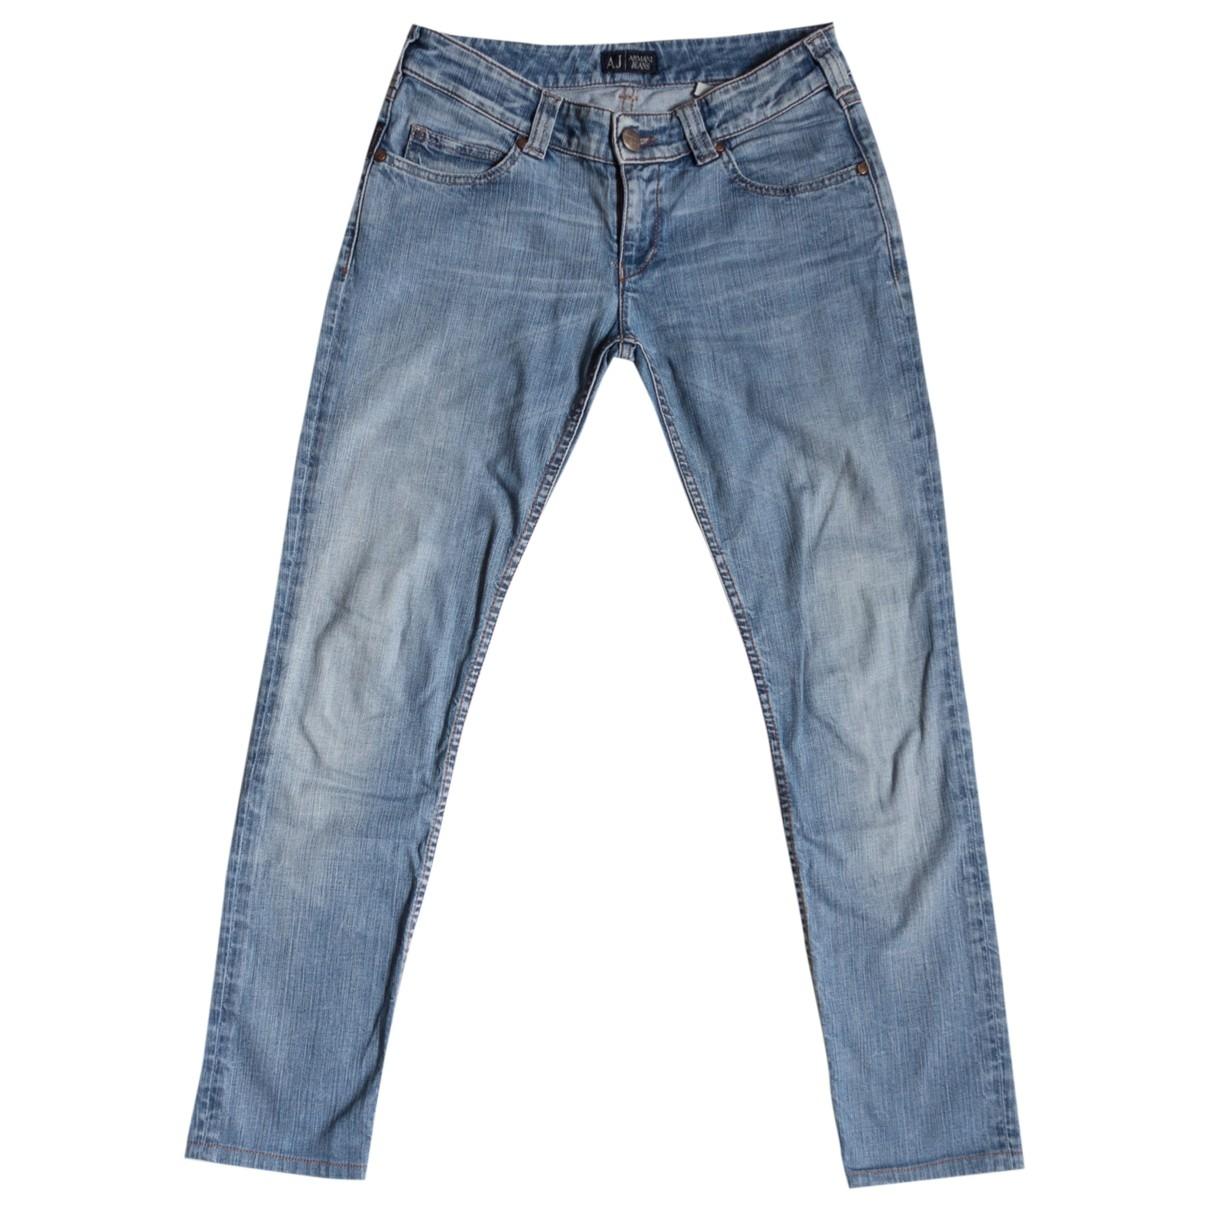 Armani Jeans \N Blue Denim - Jeans Jeans for Women 27 US